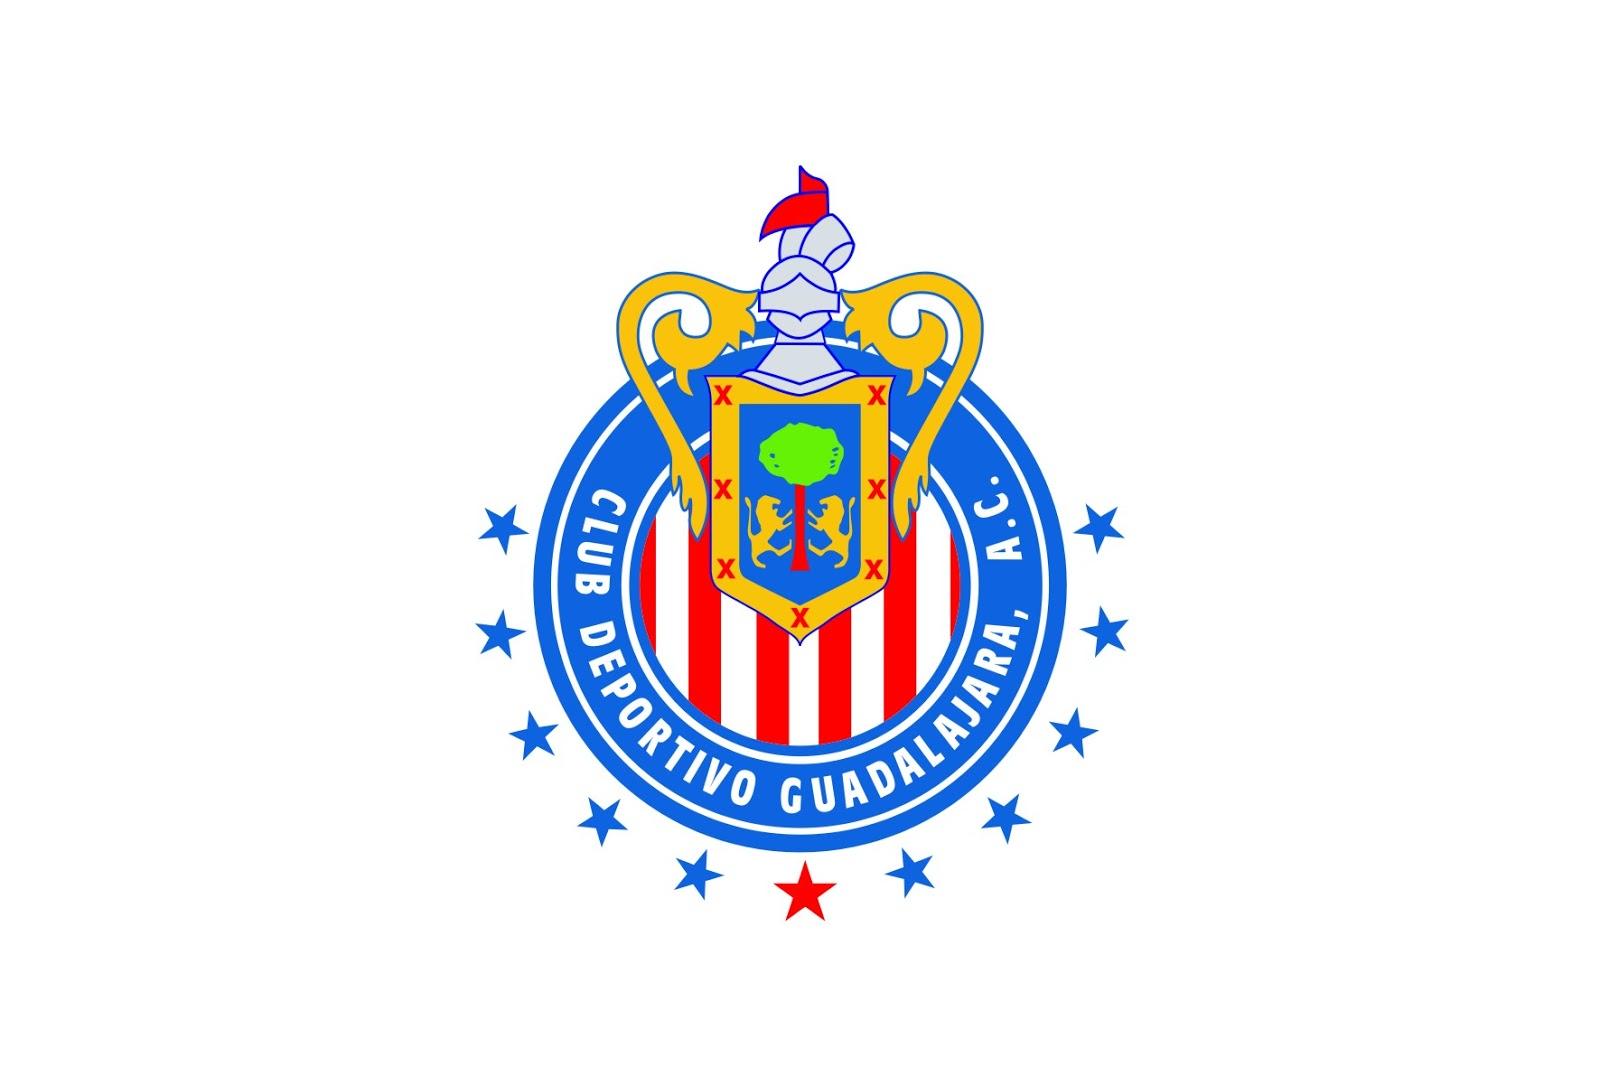 Chivas de guadalajara Logos.